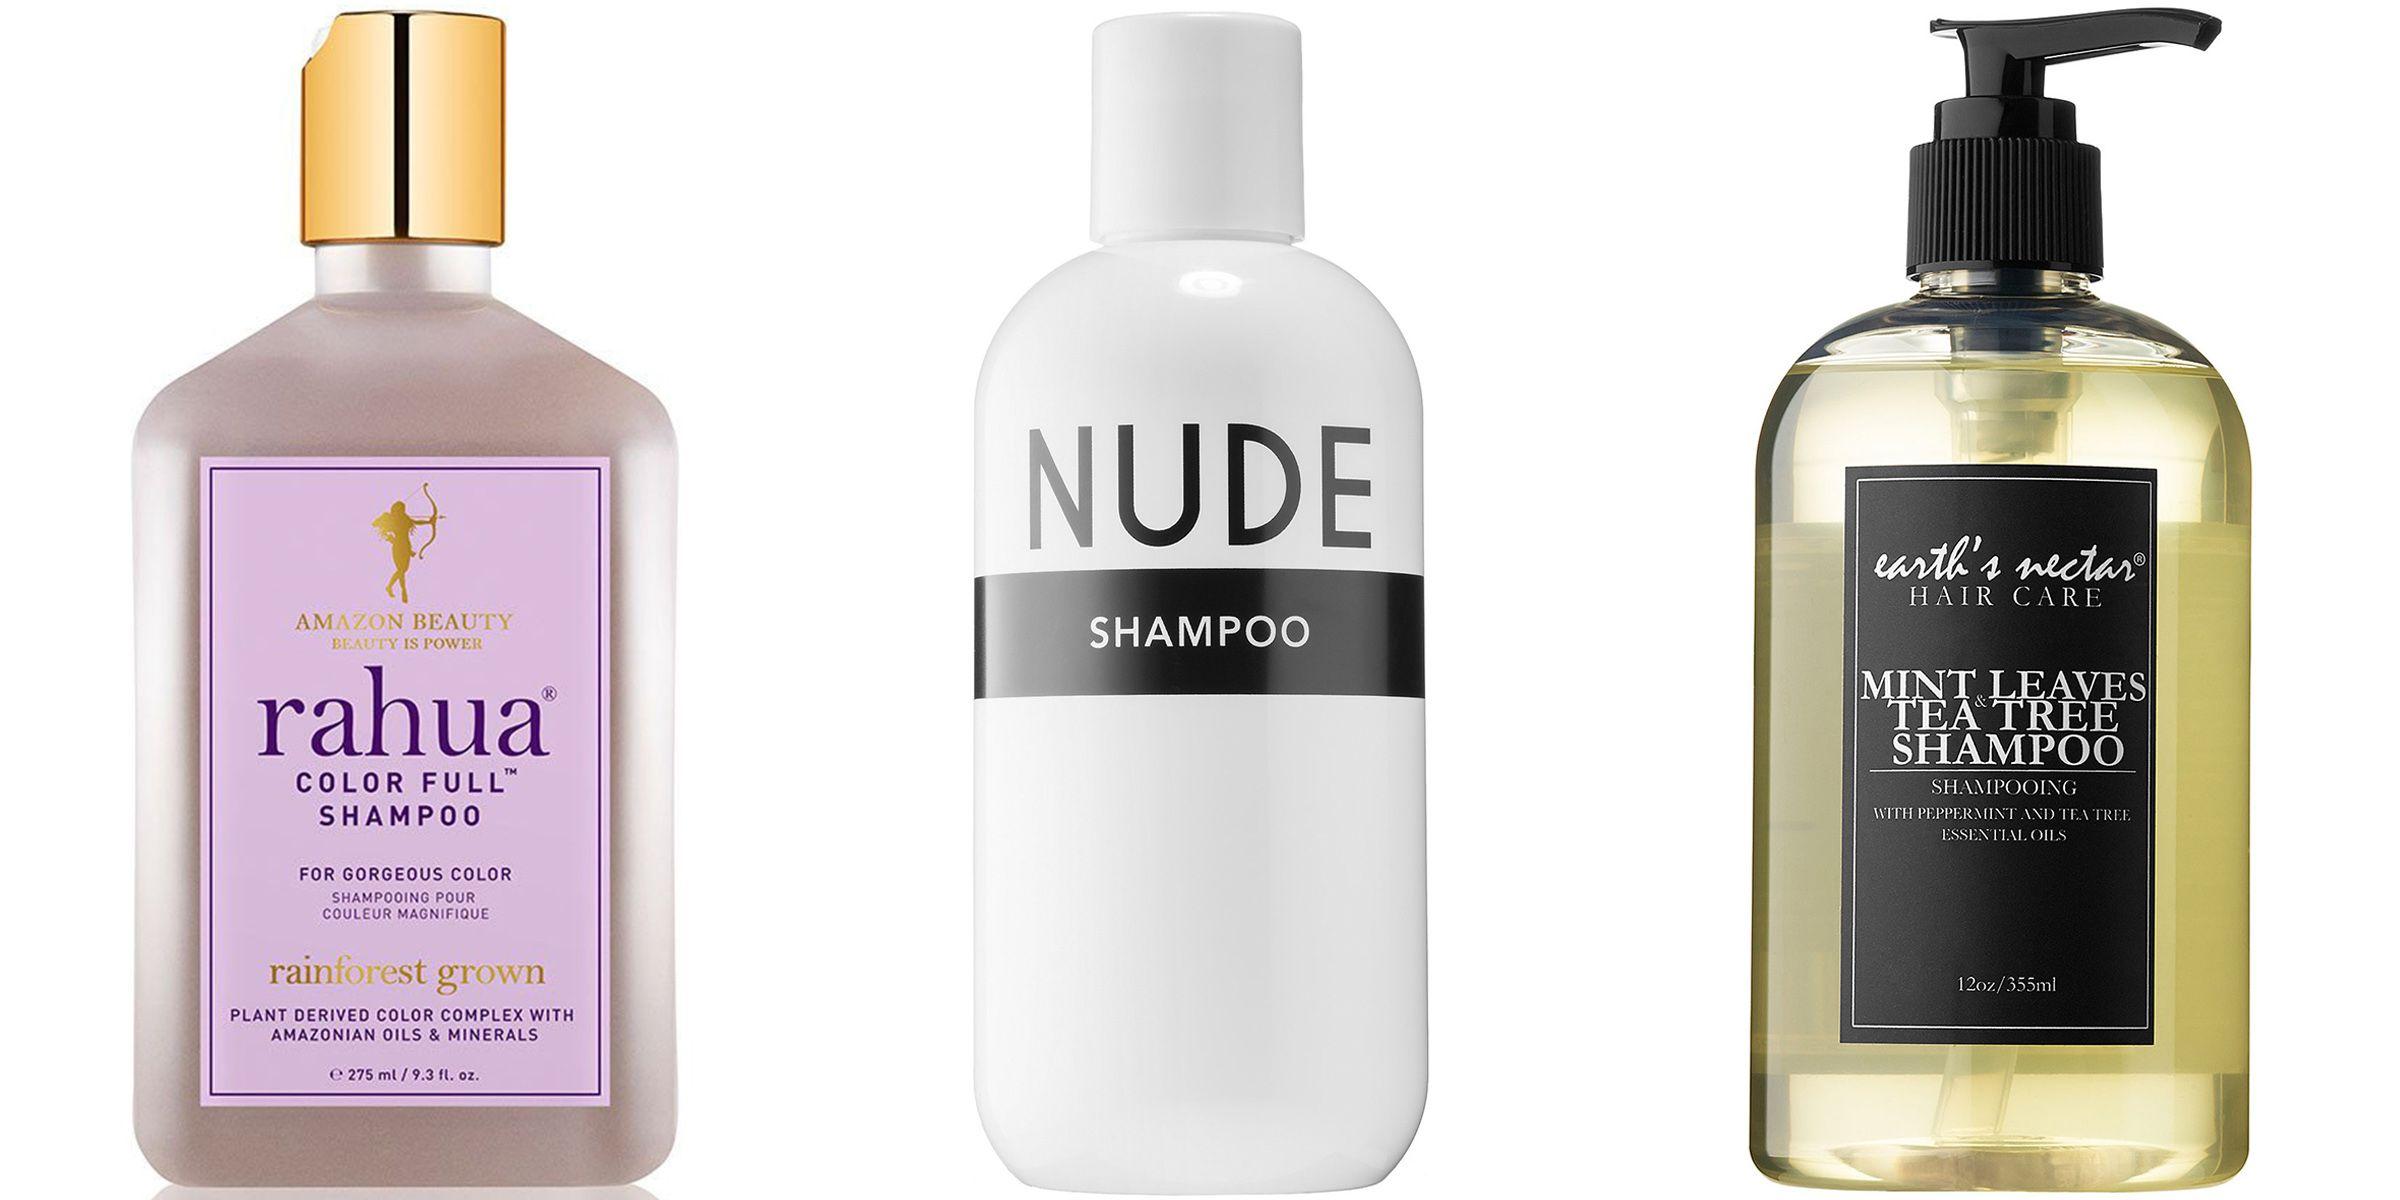 11 Best Organic Natural Shampoo All Natural And Non Toxic Shampoos